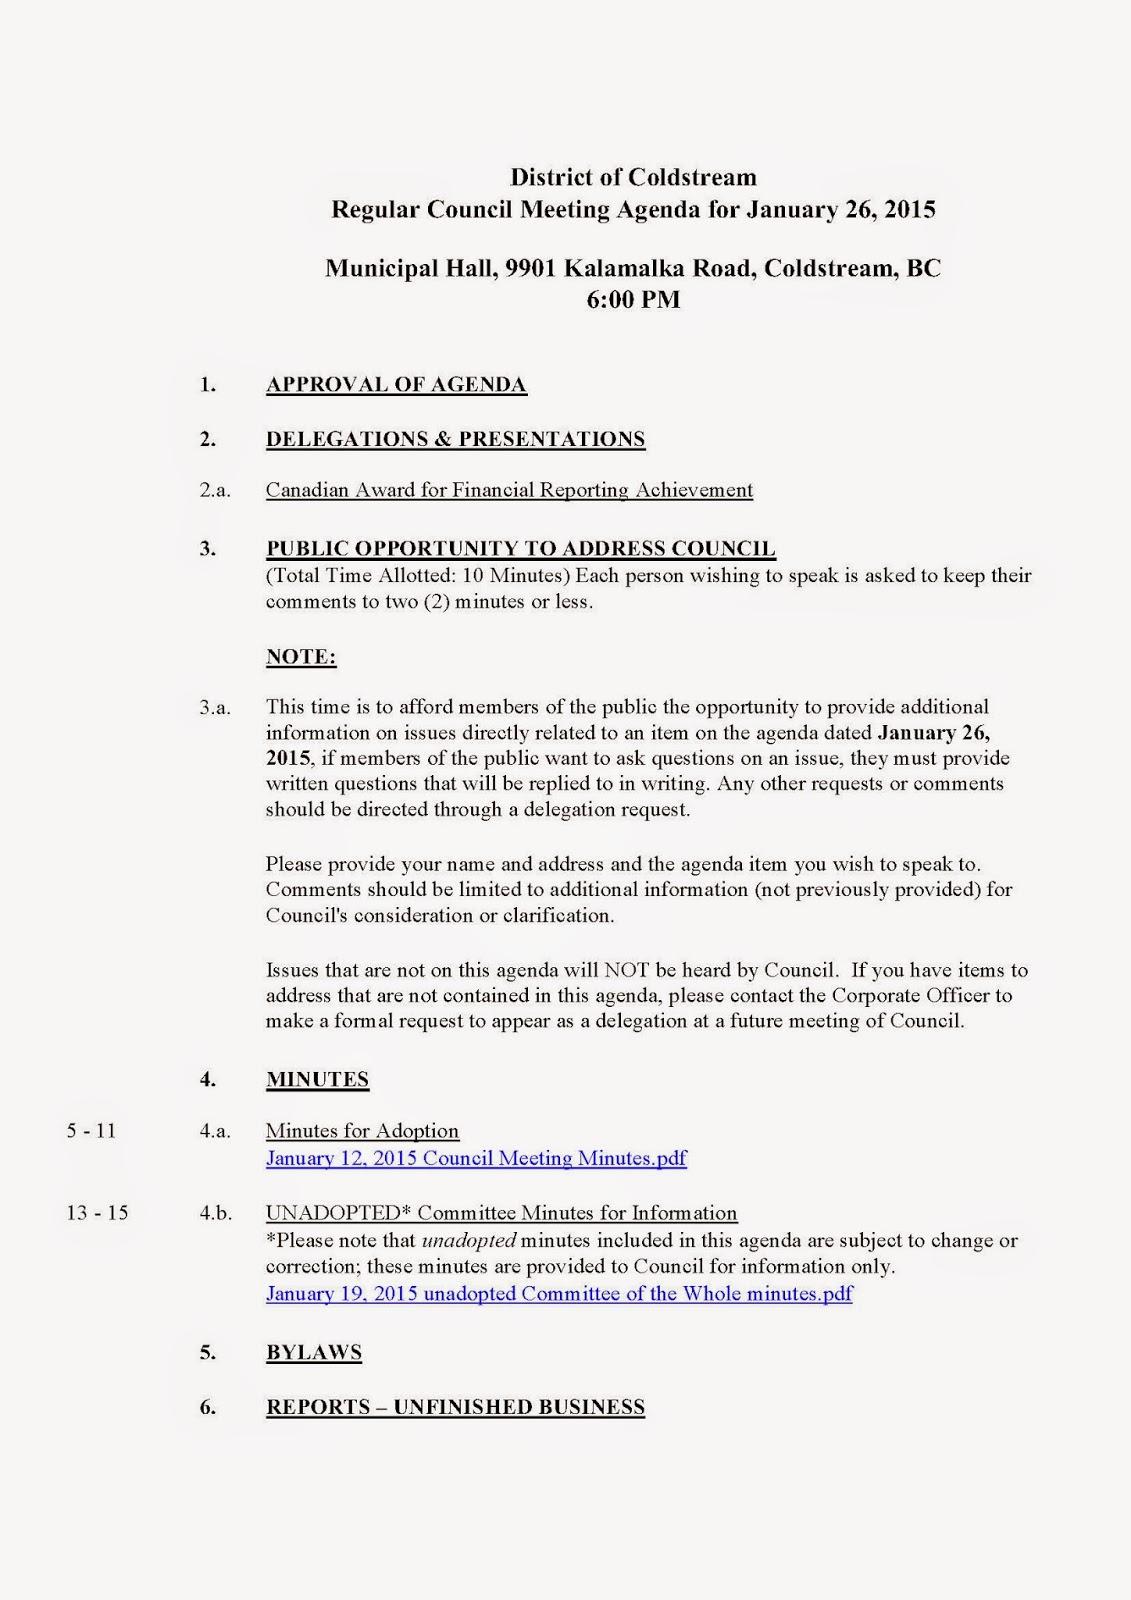 http://coldstream.civicweb.net/Documents/DocumentList.aspx?ID=19798